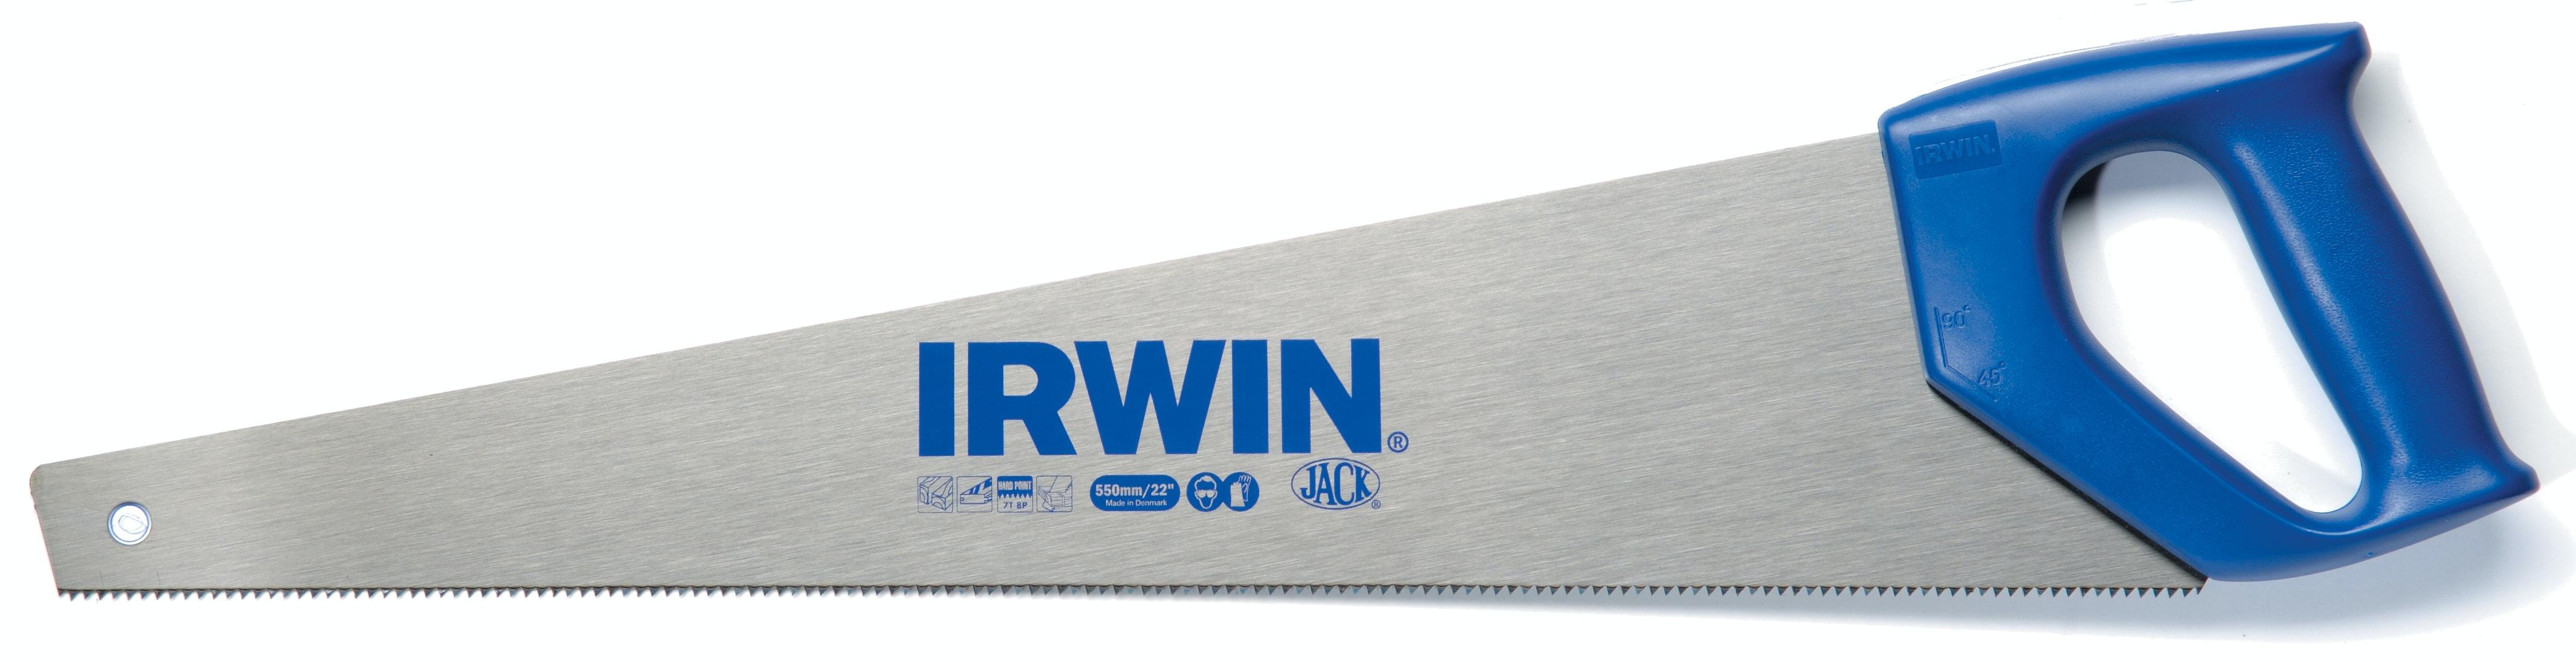 Handsåg Irwin Pro Entry 7T 550mm